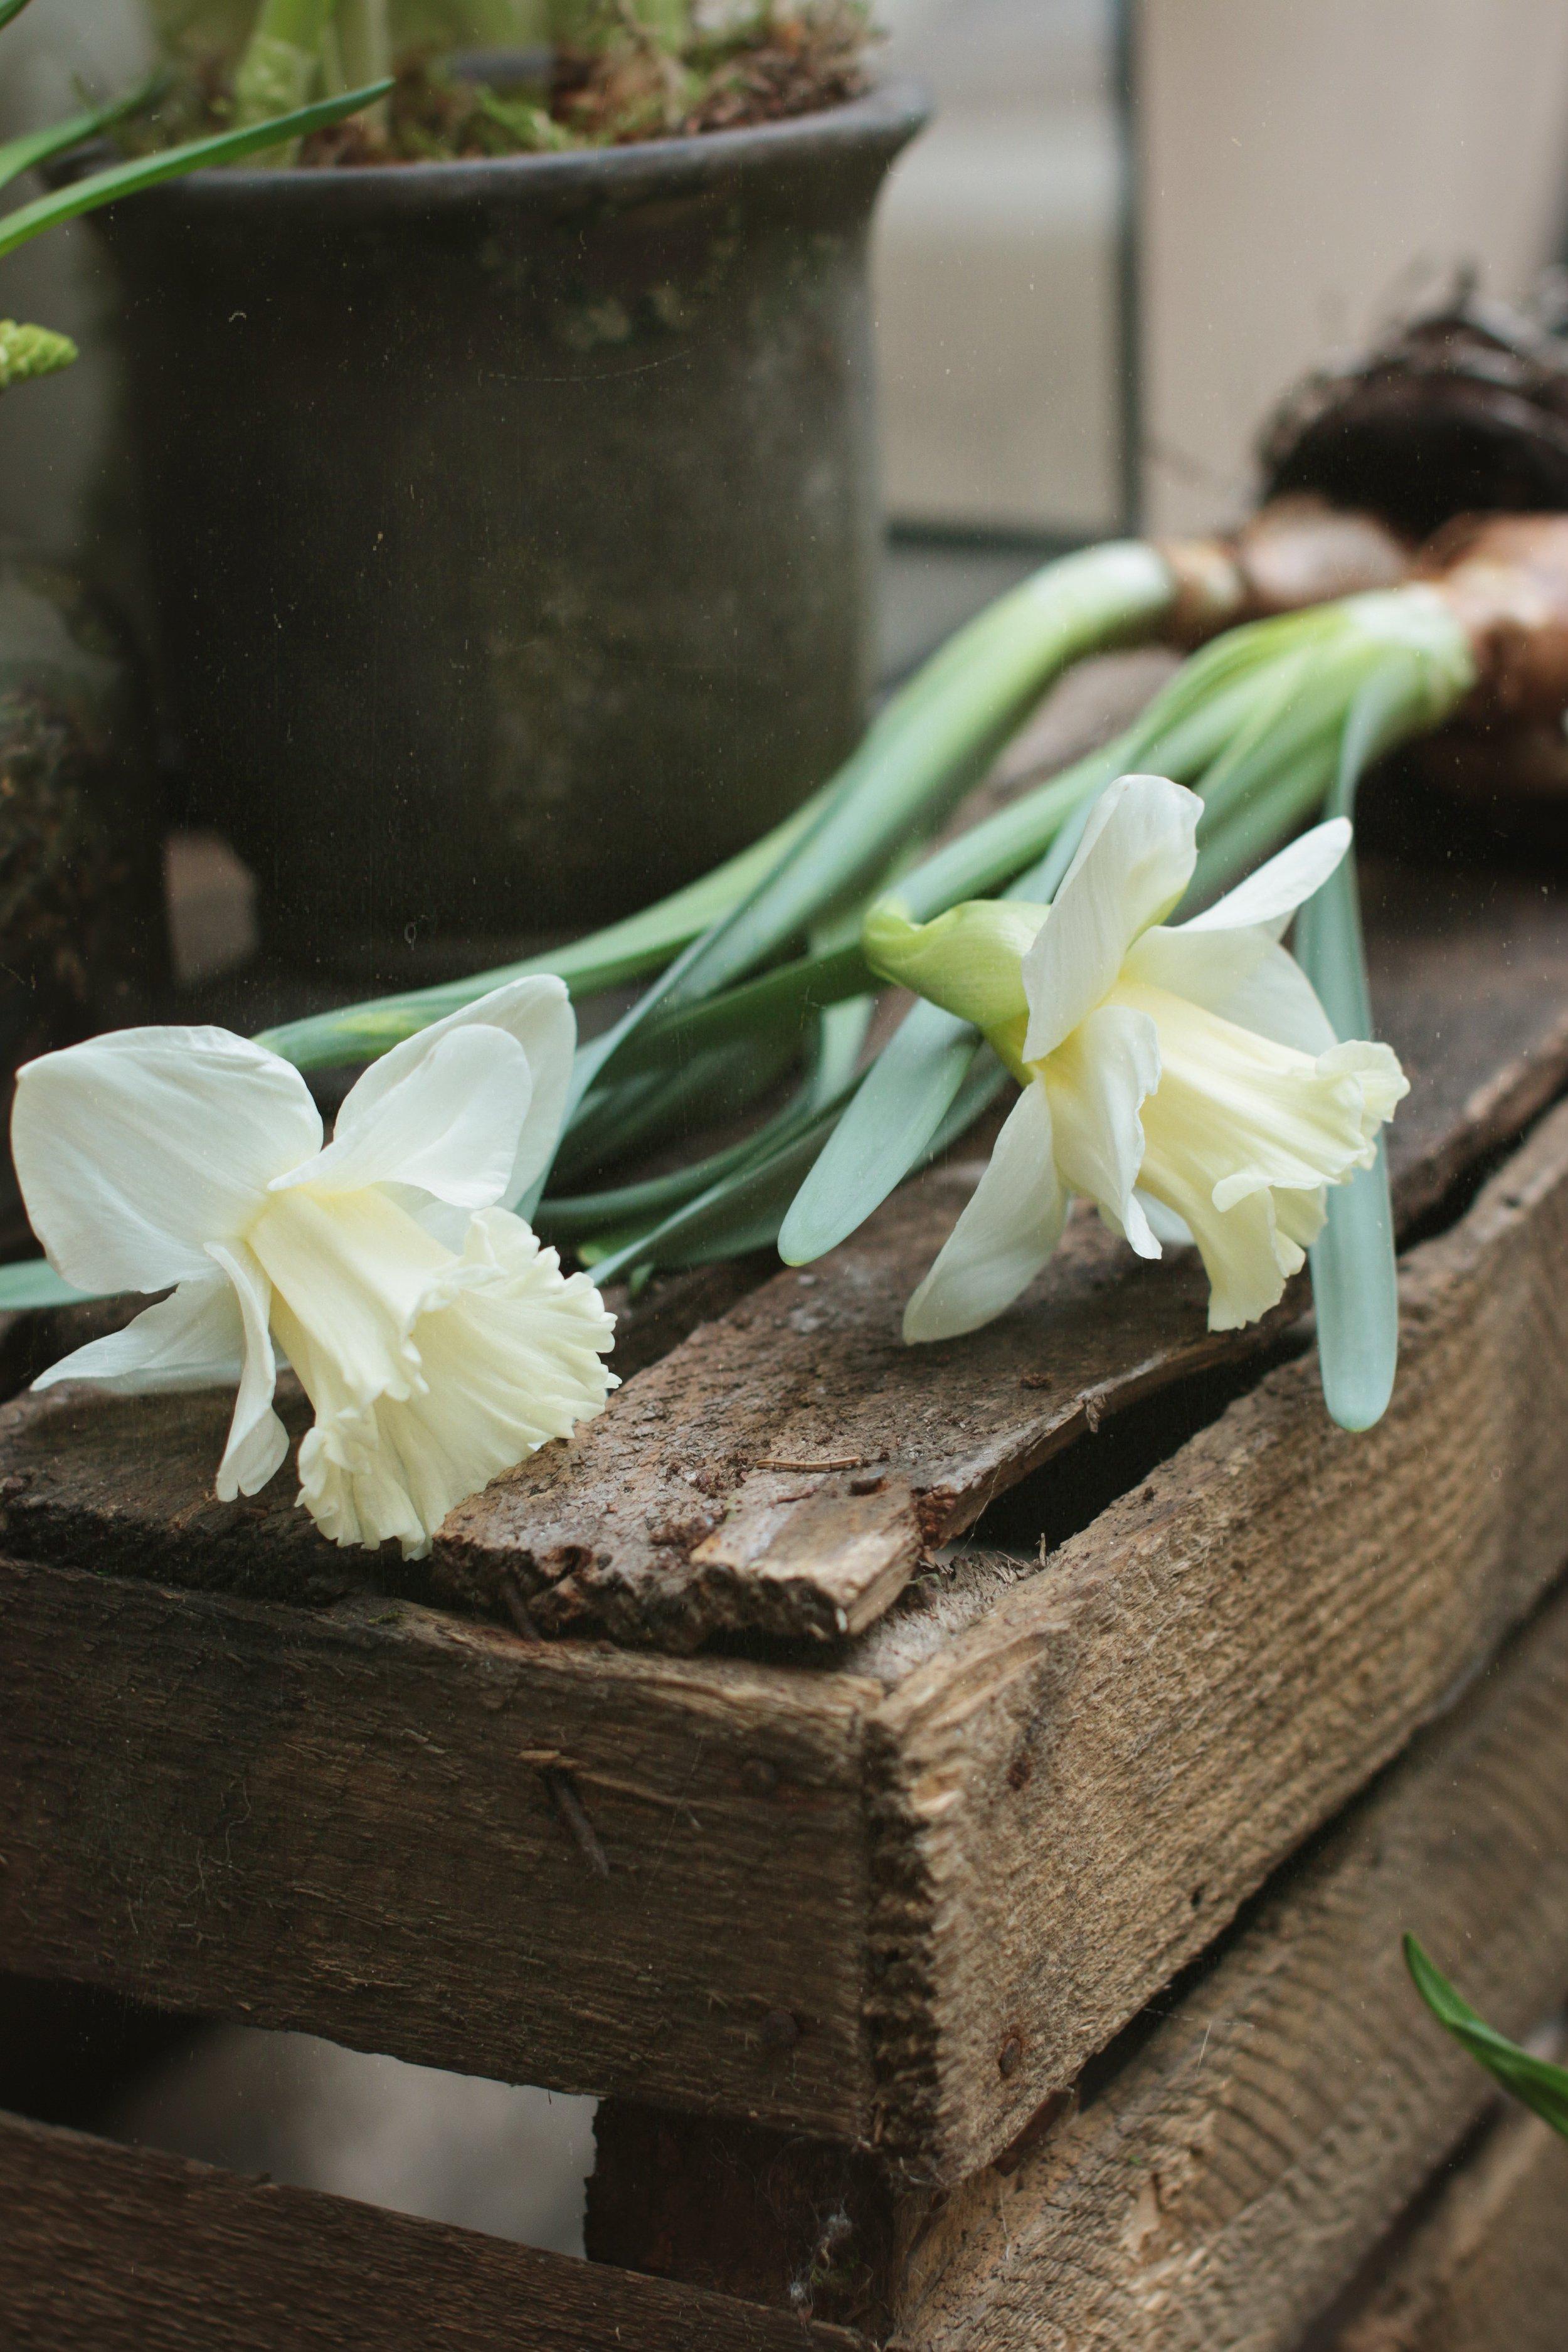 Valkoisena kukkiva narsissi 'Geneve'